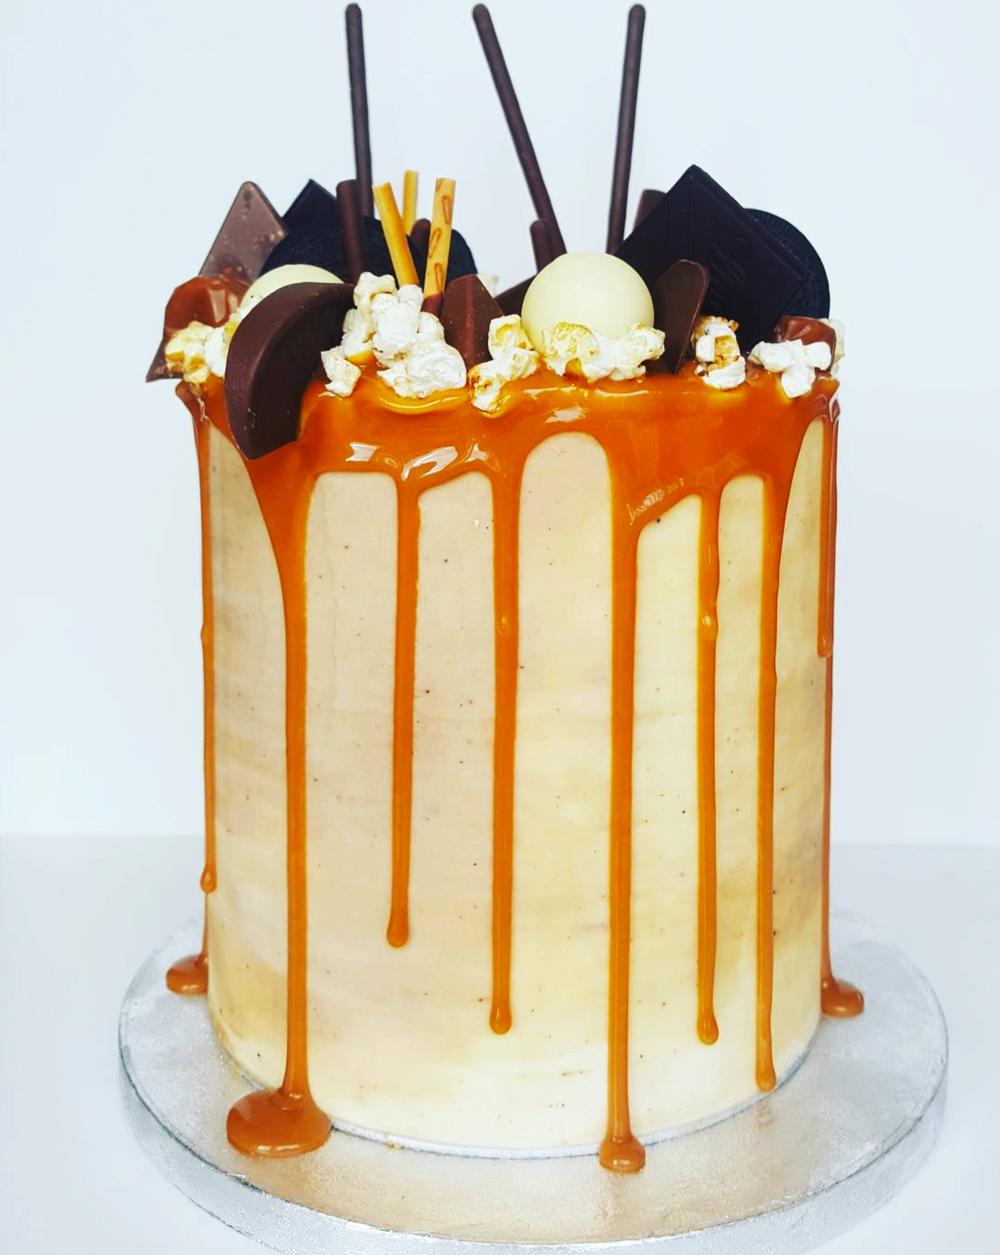 DOTTY ROSE CAKE DESIGN 4 CARAMEL CHOCOLATE BIRTHDAY CAKE.png